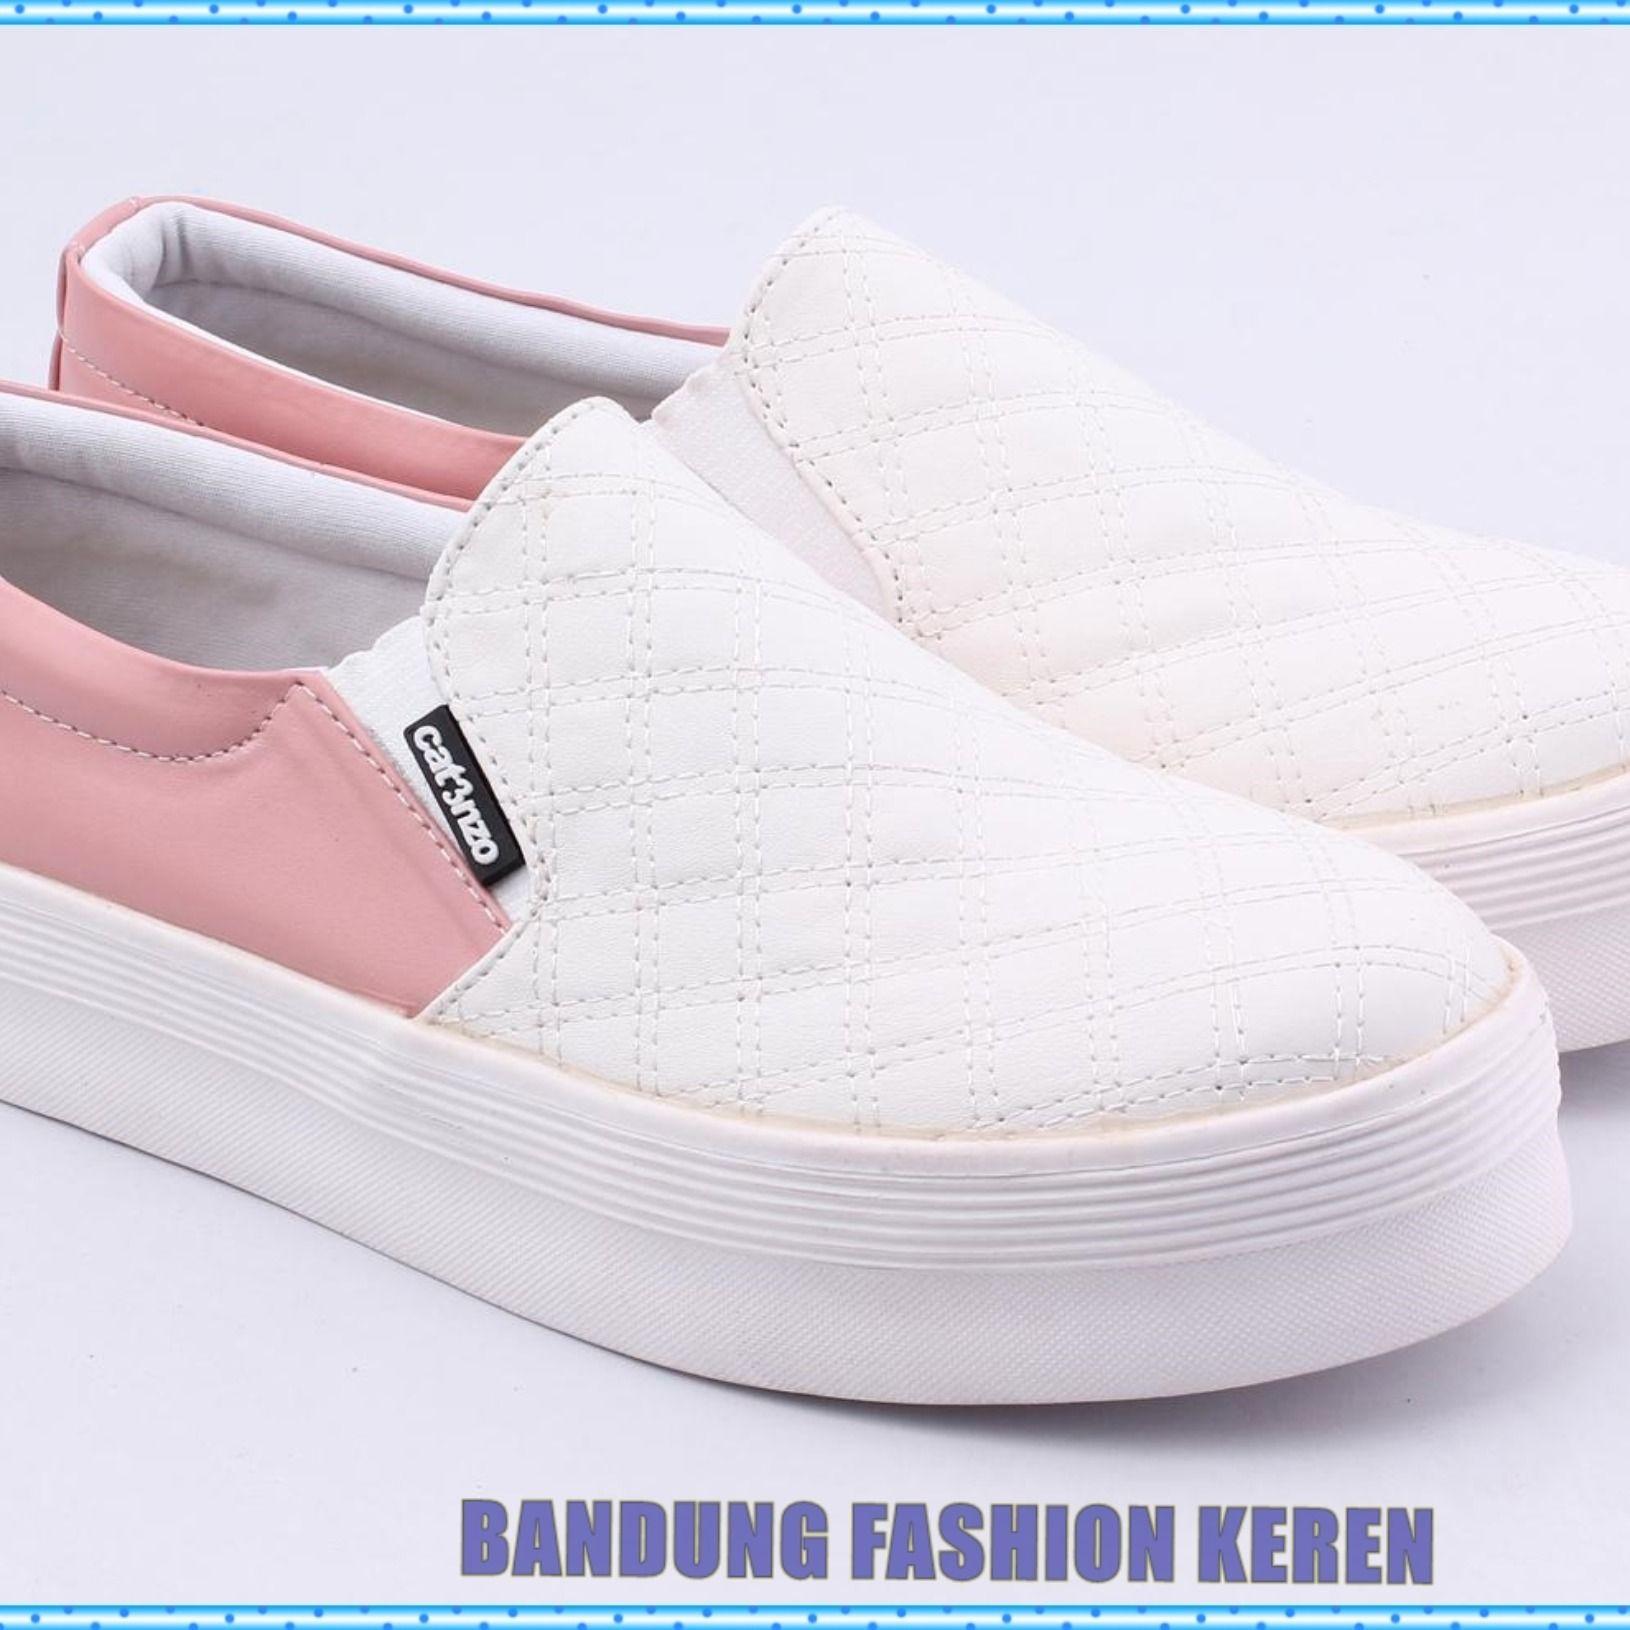 Sepatu Casual Wanita Dh 060 Produk Fashion Handmade Terbaik 100